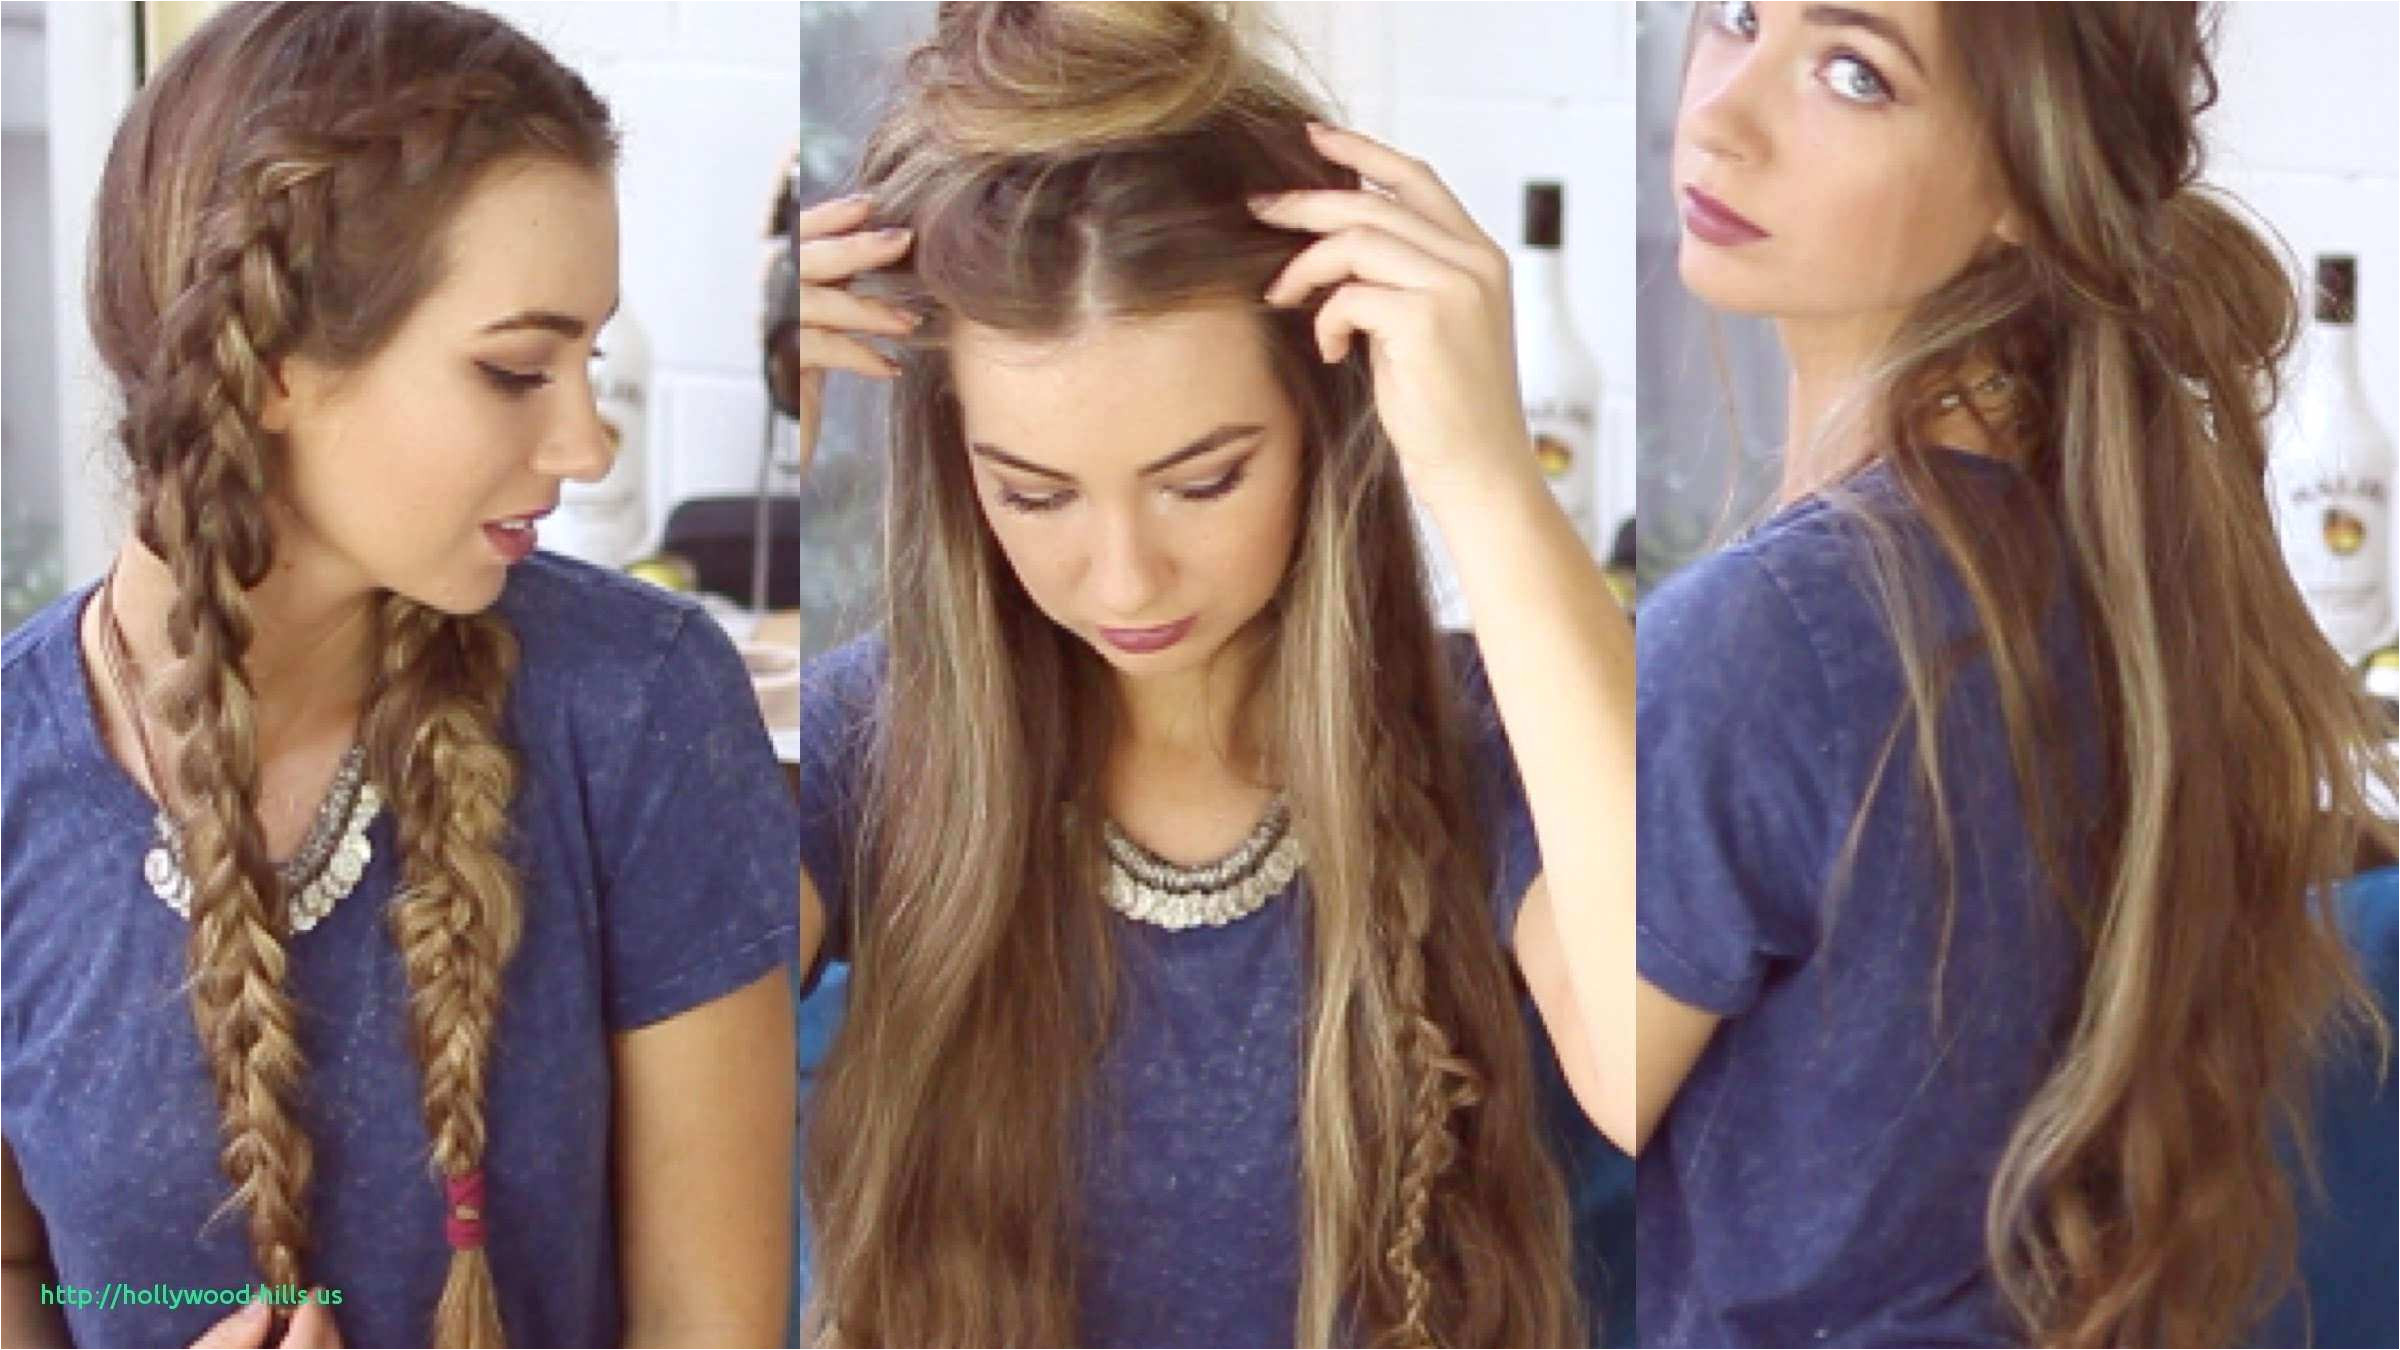 Girls Easy Hairstyles For School Elegant Beautiful Cute Quick And Easy Hairstyles For Short Hair